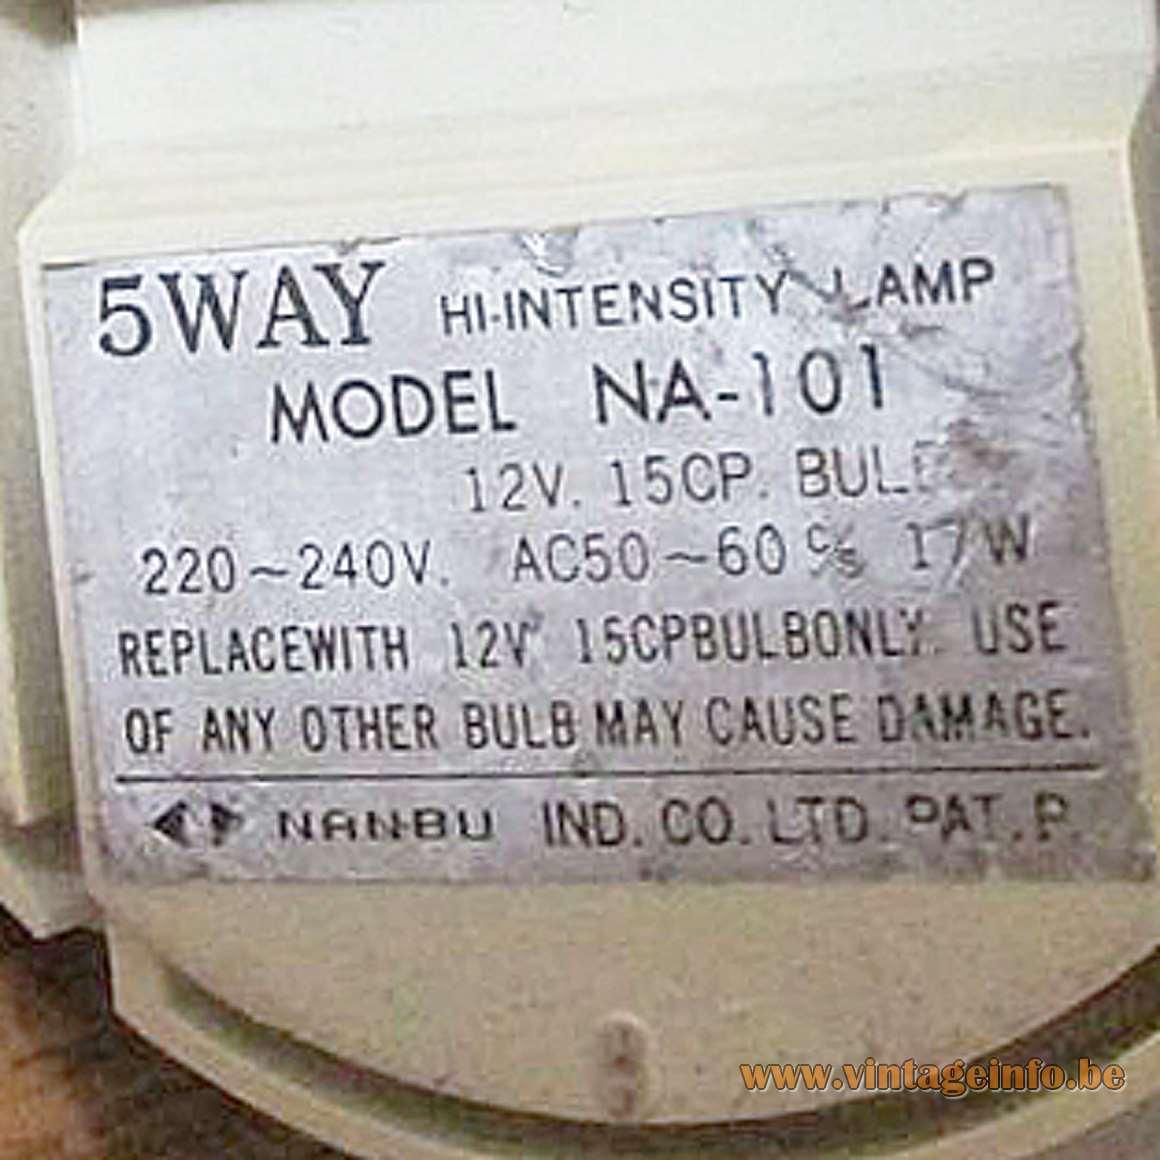 Nanbu Industrial Co. Ltd. - 5WAY Model NA-101 - Label